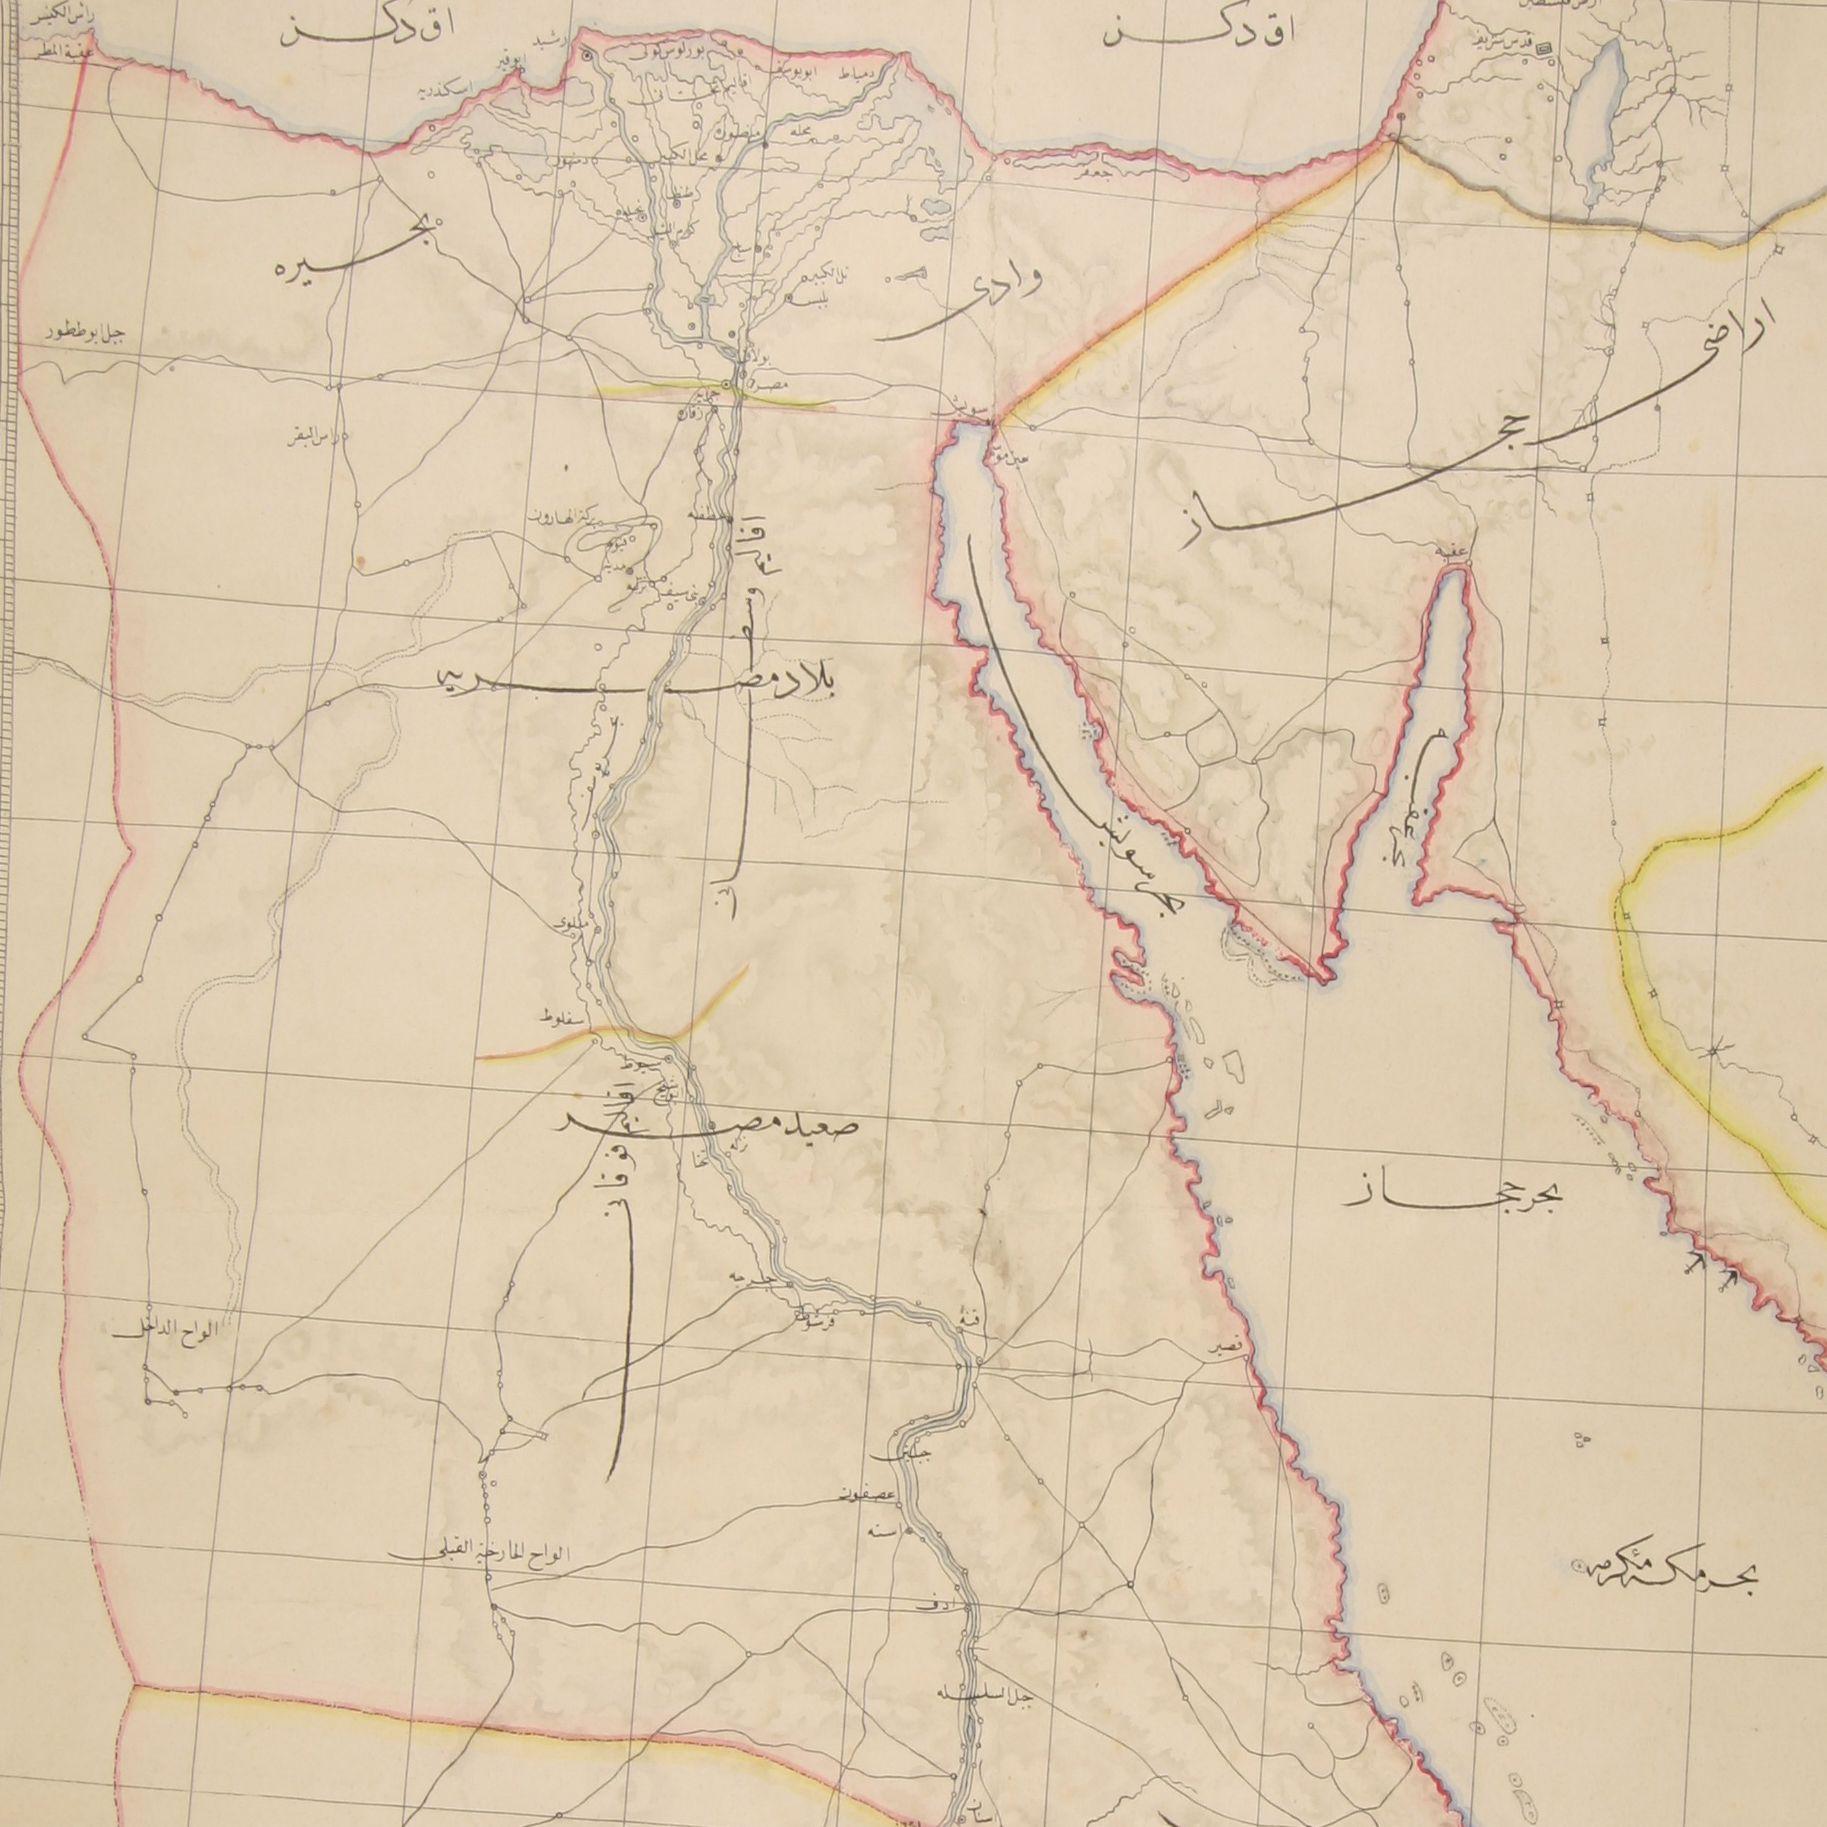 Egypt, Libya, and the Desert Borderlands | Matthew Ellis